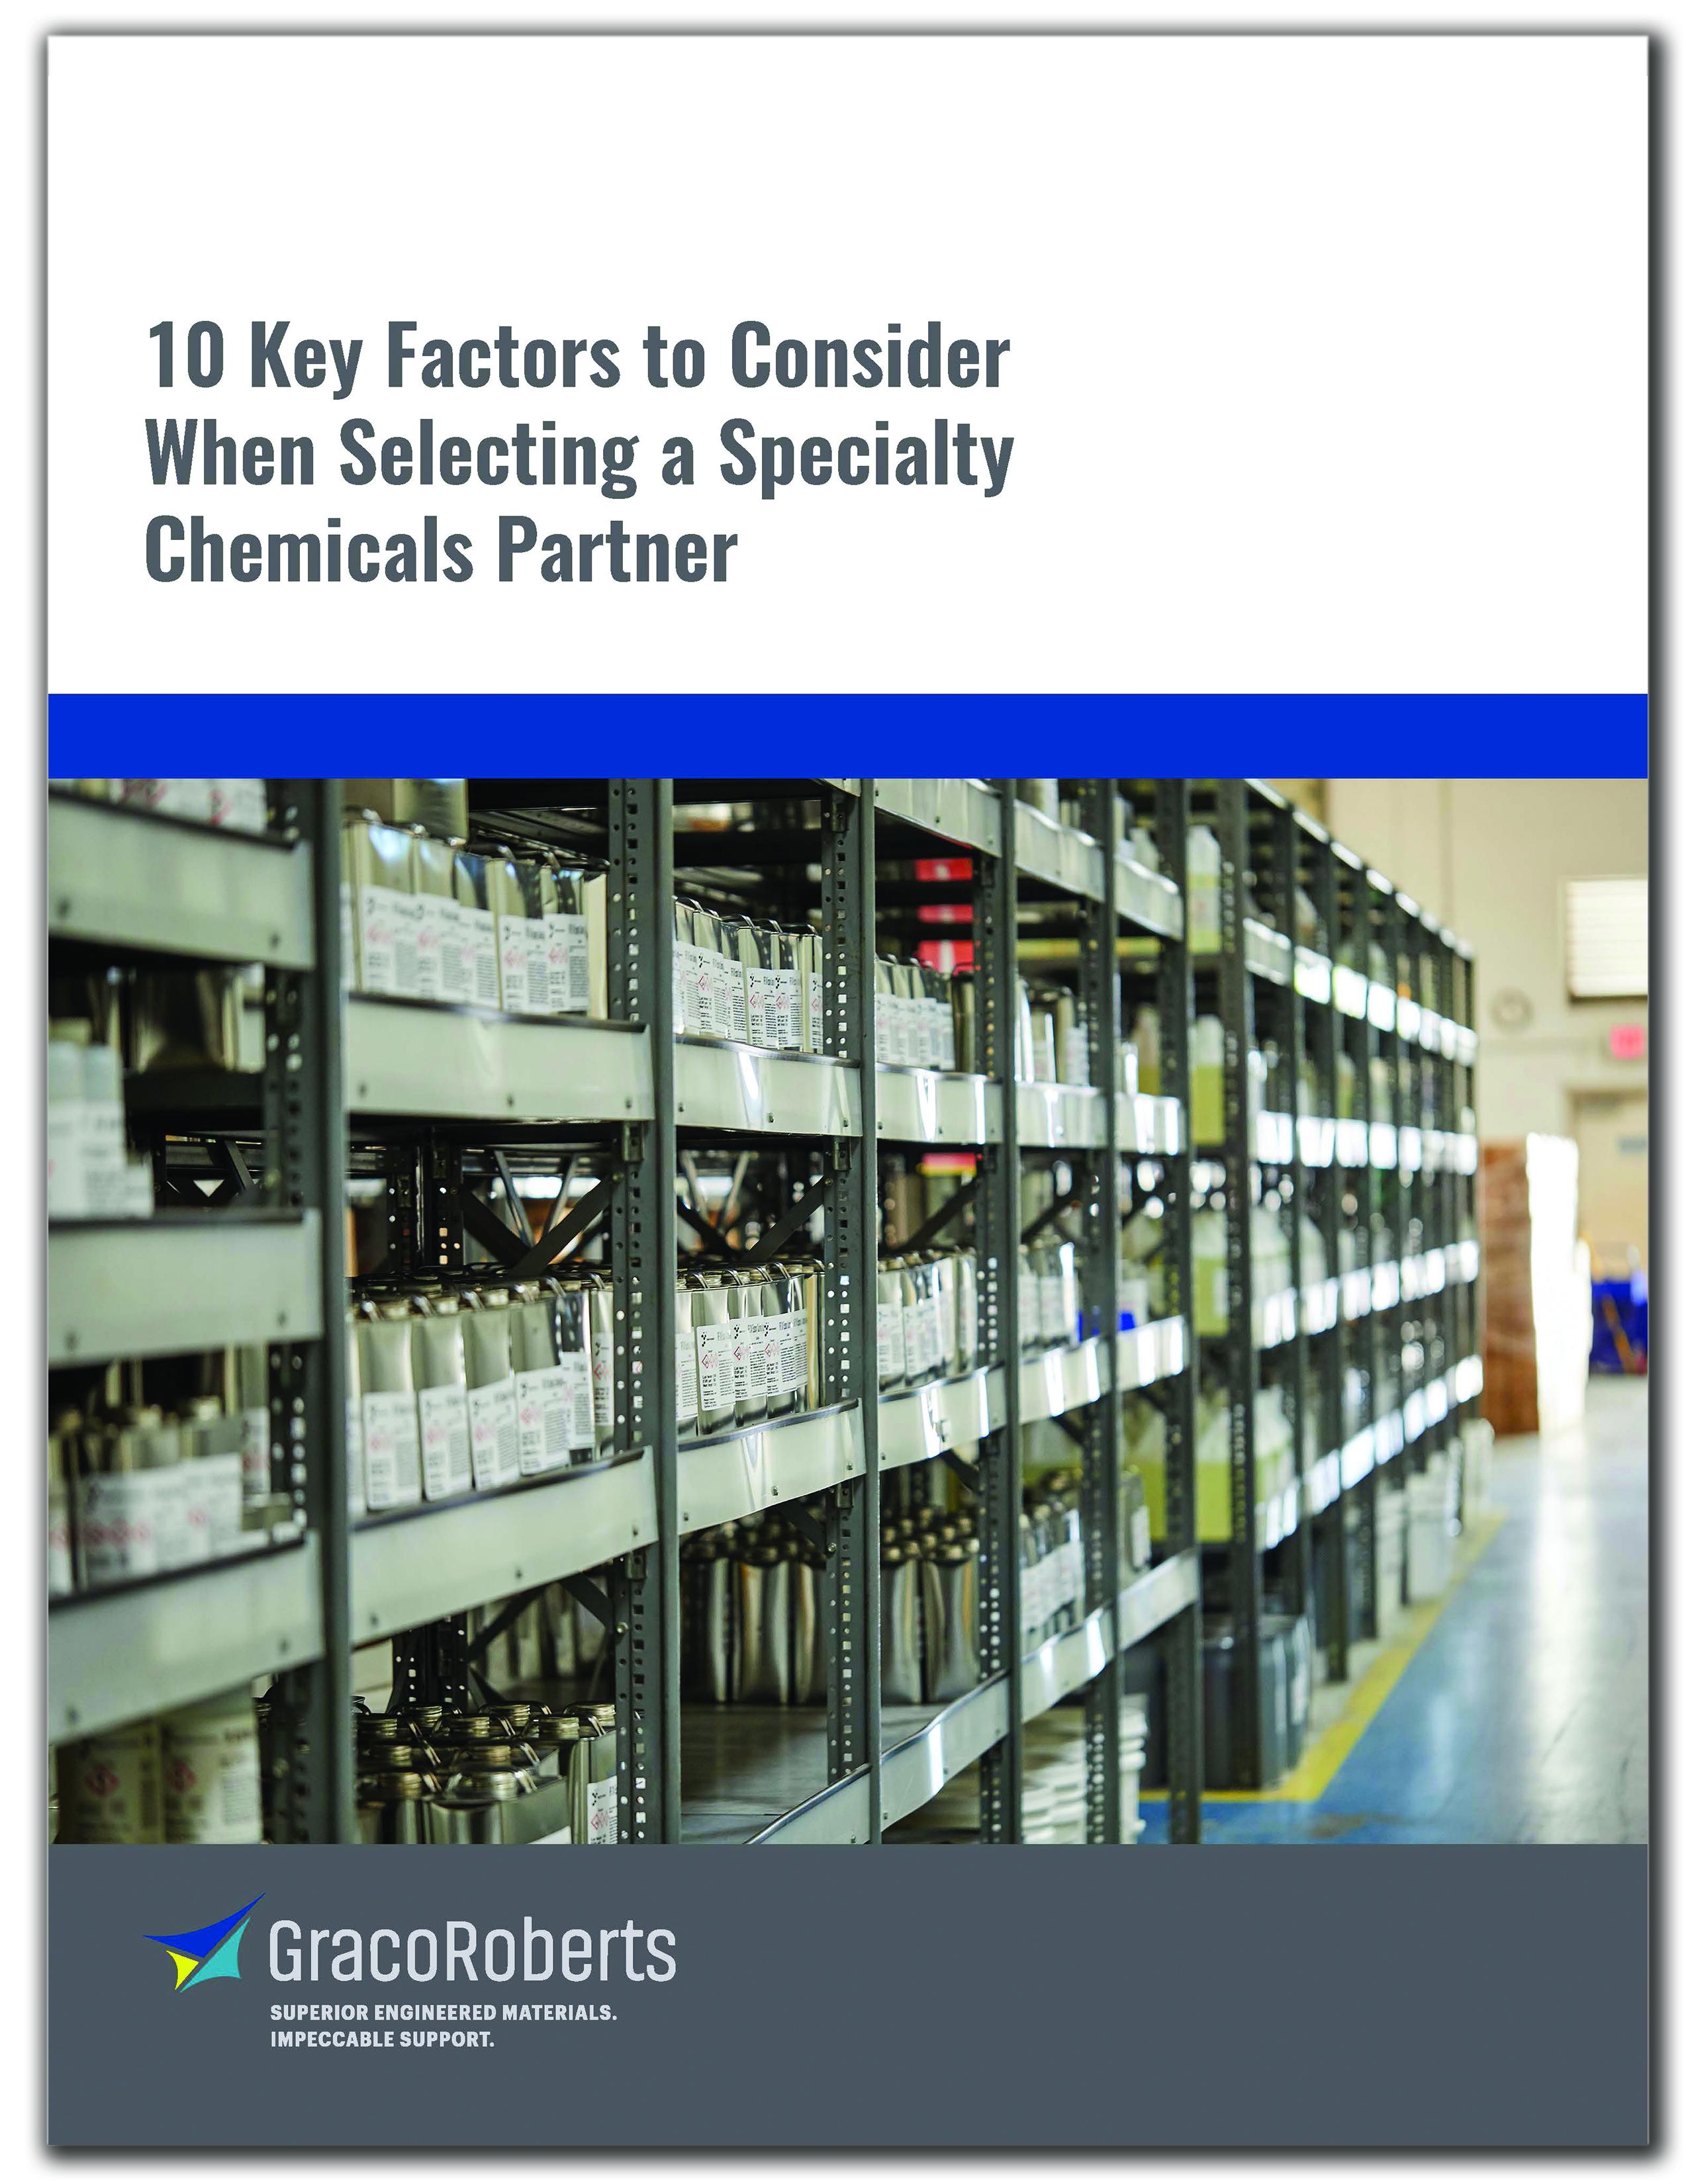 Whitepaper Cover - 10 Key Factors-1